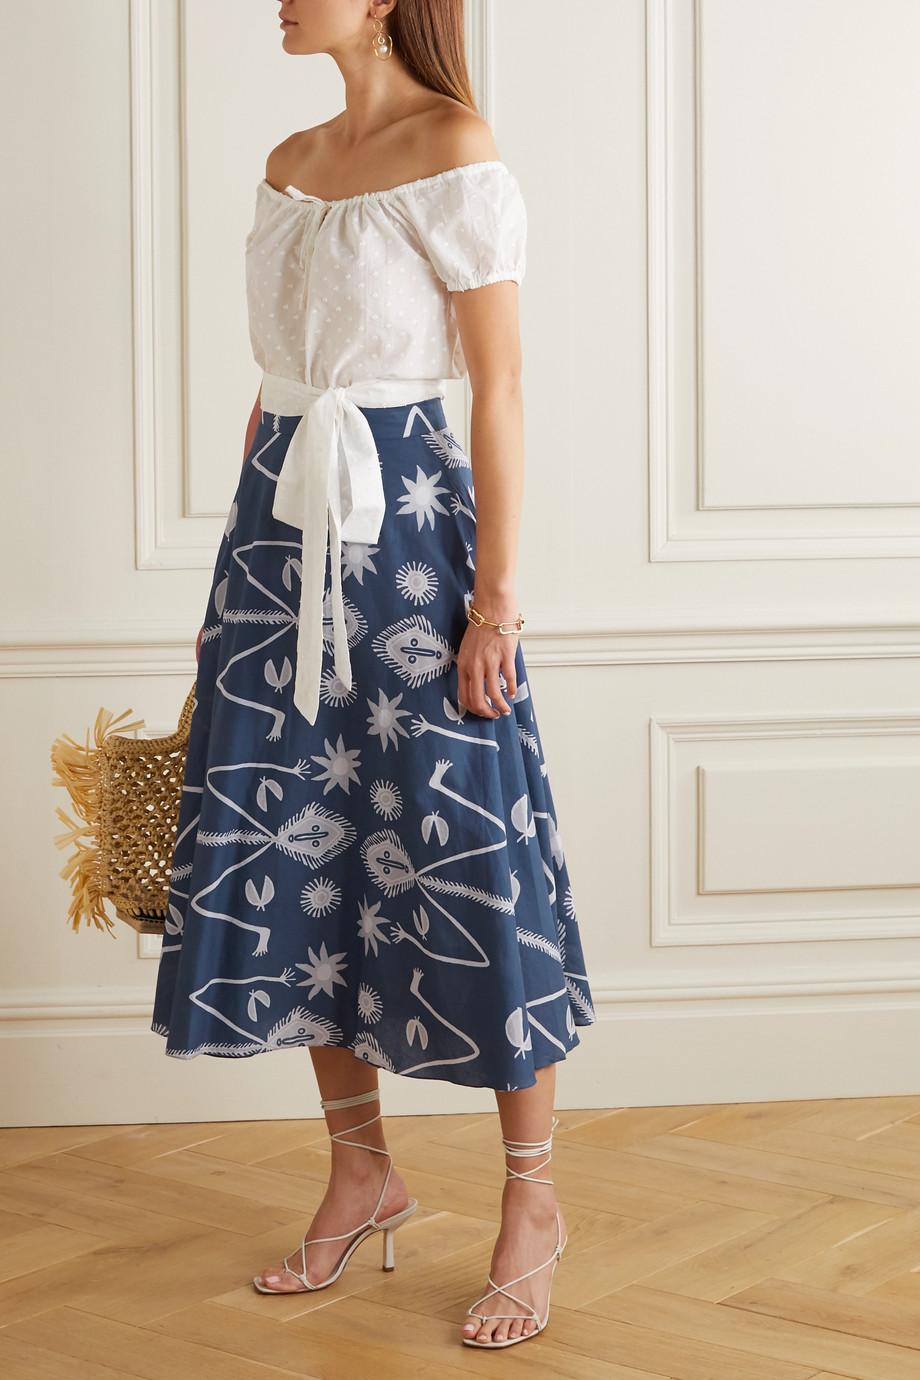 ARoss Girl x Soler Alex printed cotton-voile midi skirt